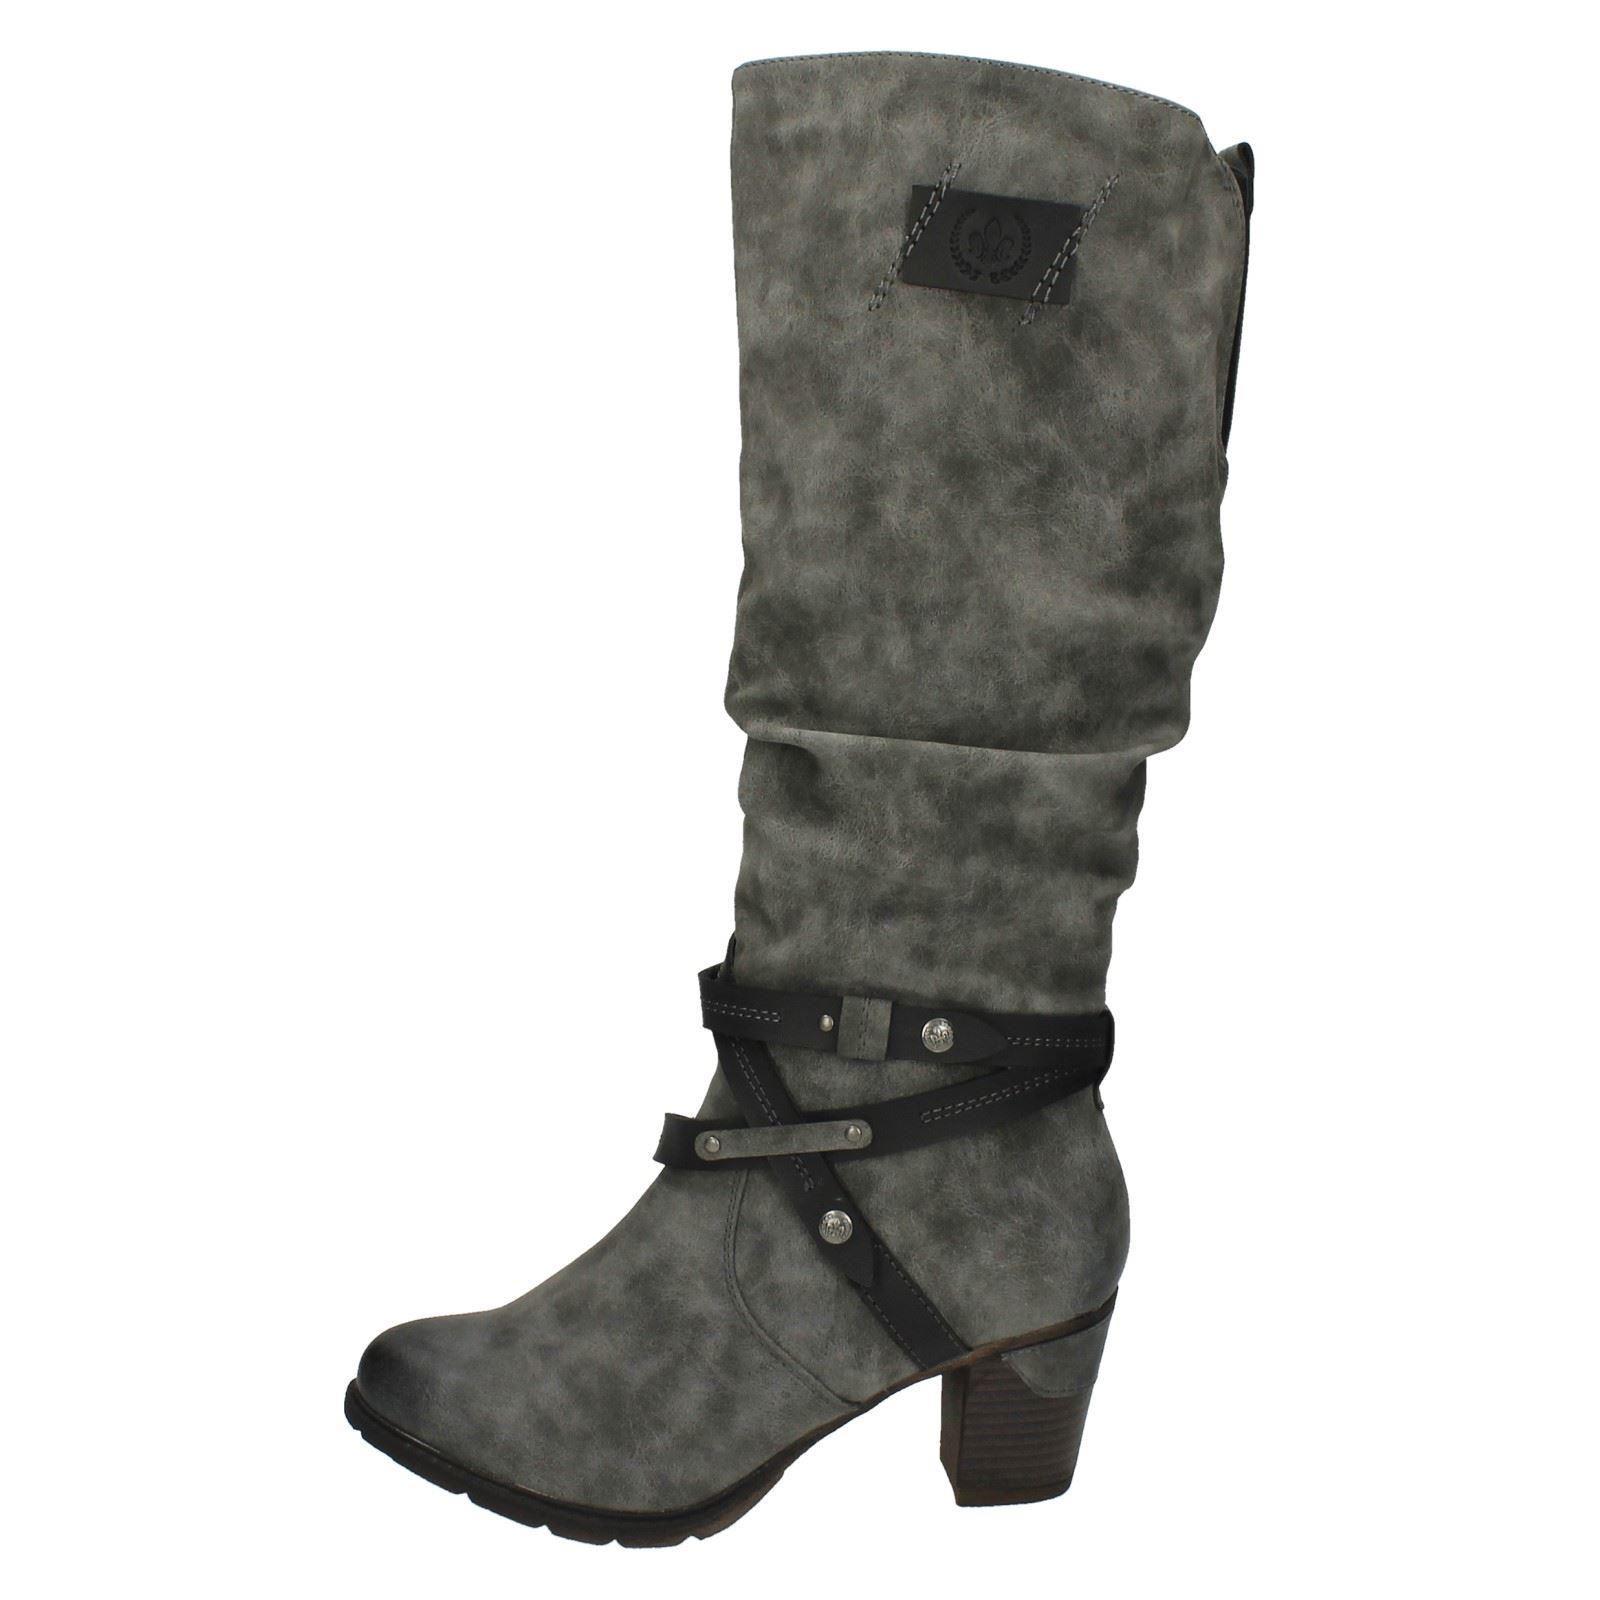 039-Damen-Rieker-039-konisch-Zeh-warm-gefuettert-lange-Stiefel-96054